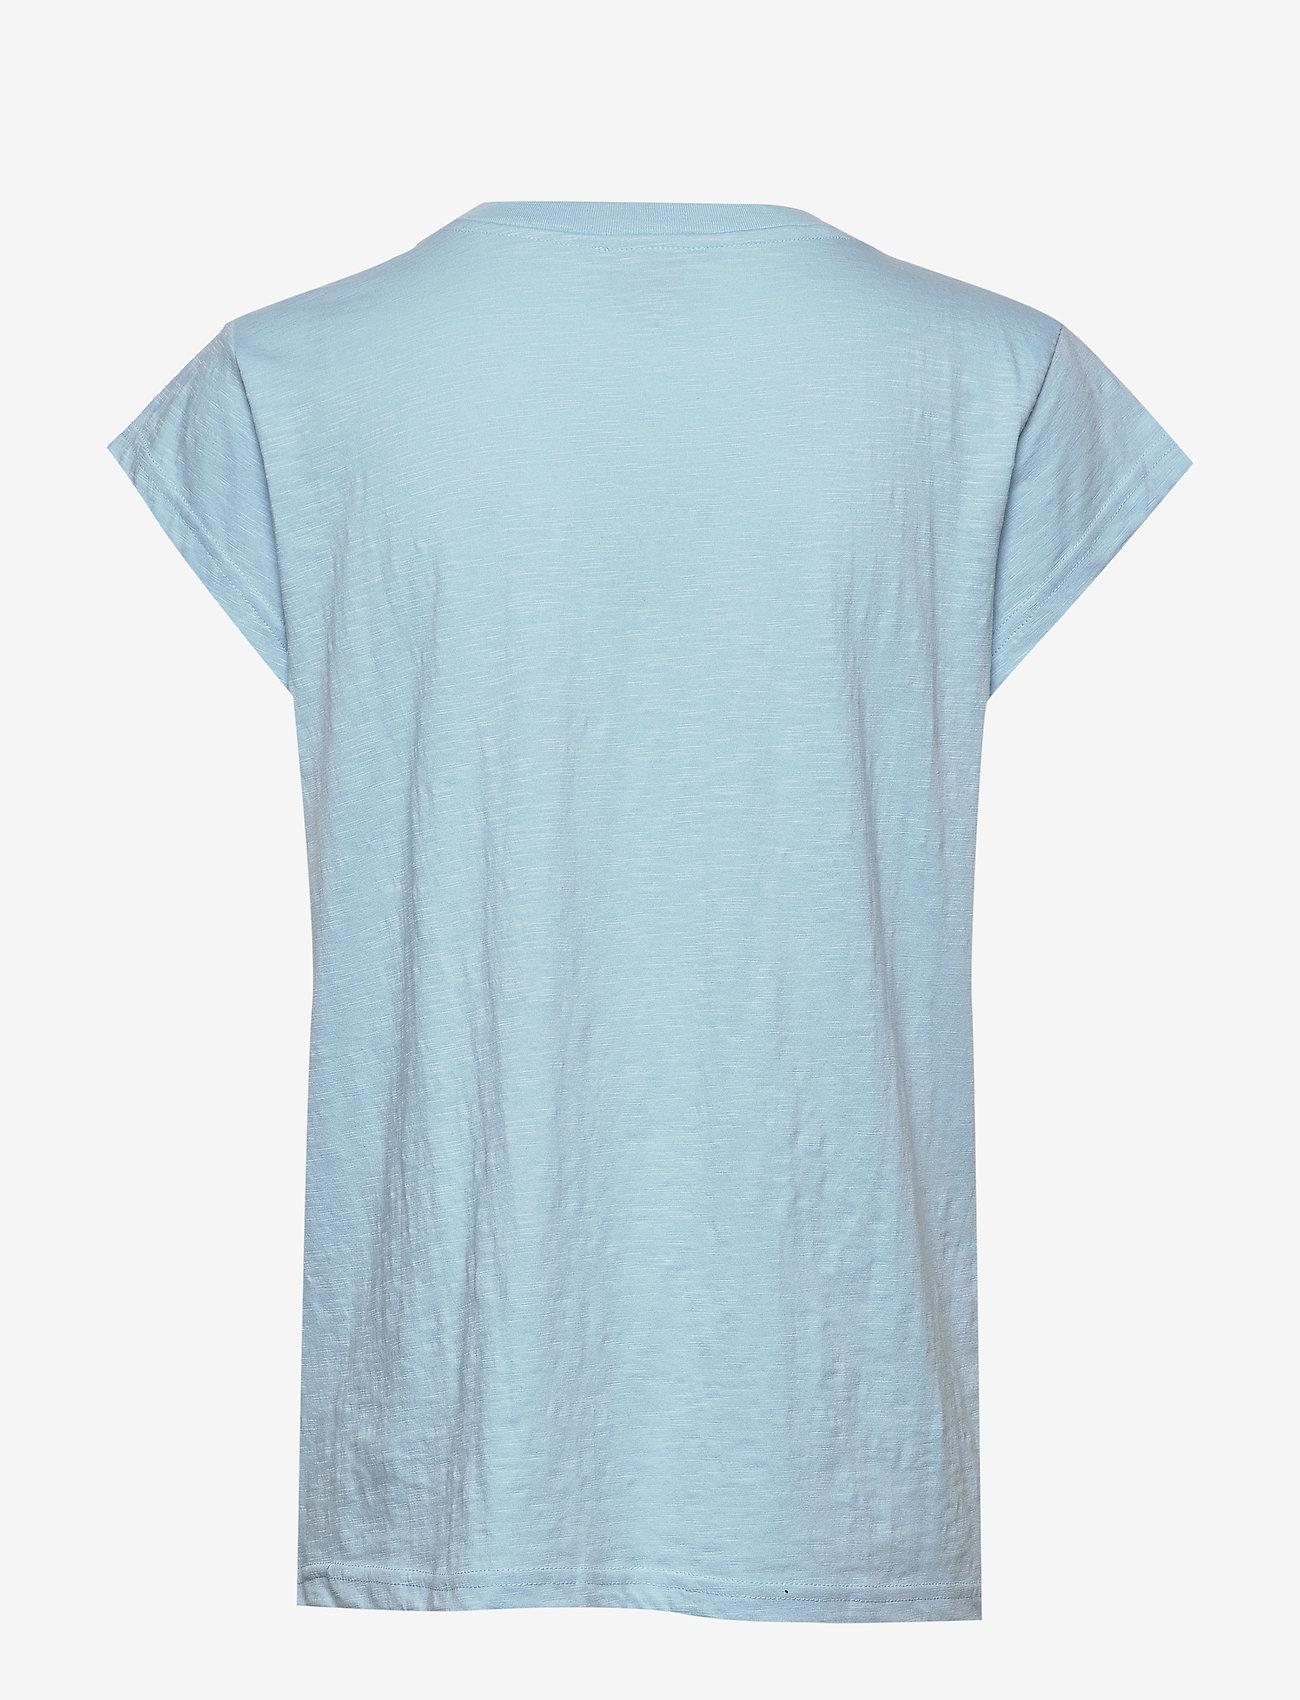 Minus - Leti tee - t-shirts - bounty blue - 1